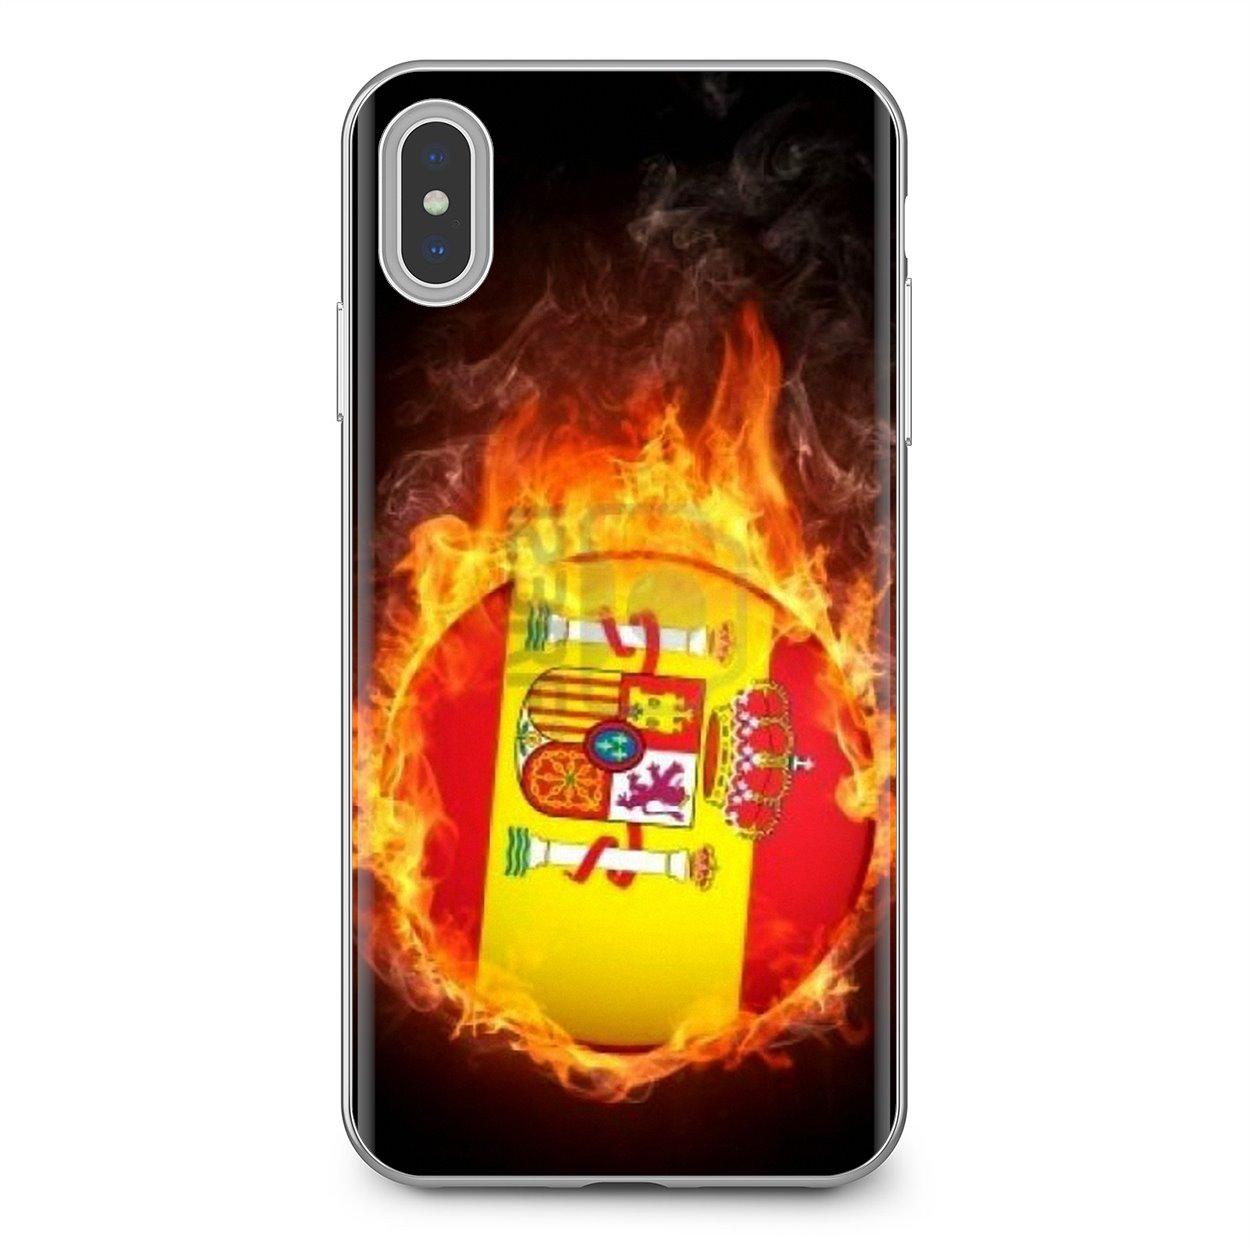 Spain Euro 2016 Squad Logo For BQ Aquaris C U2 U V X2 X Lite Pro Plus E4.5 M4.5 X5 E5 4G M 2017 Cute Silicone Phone Case